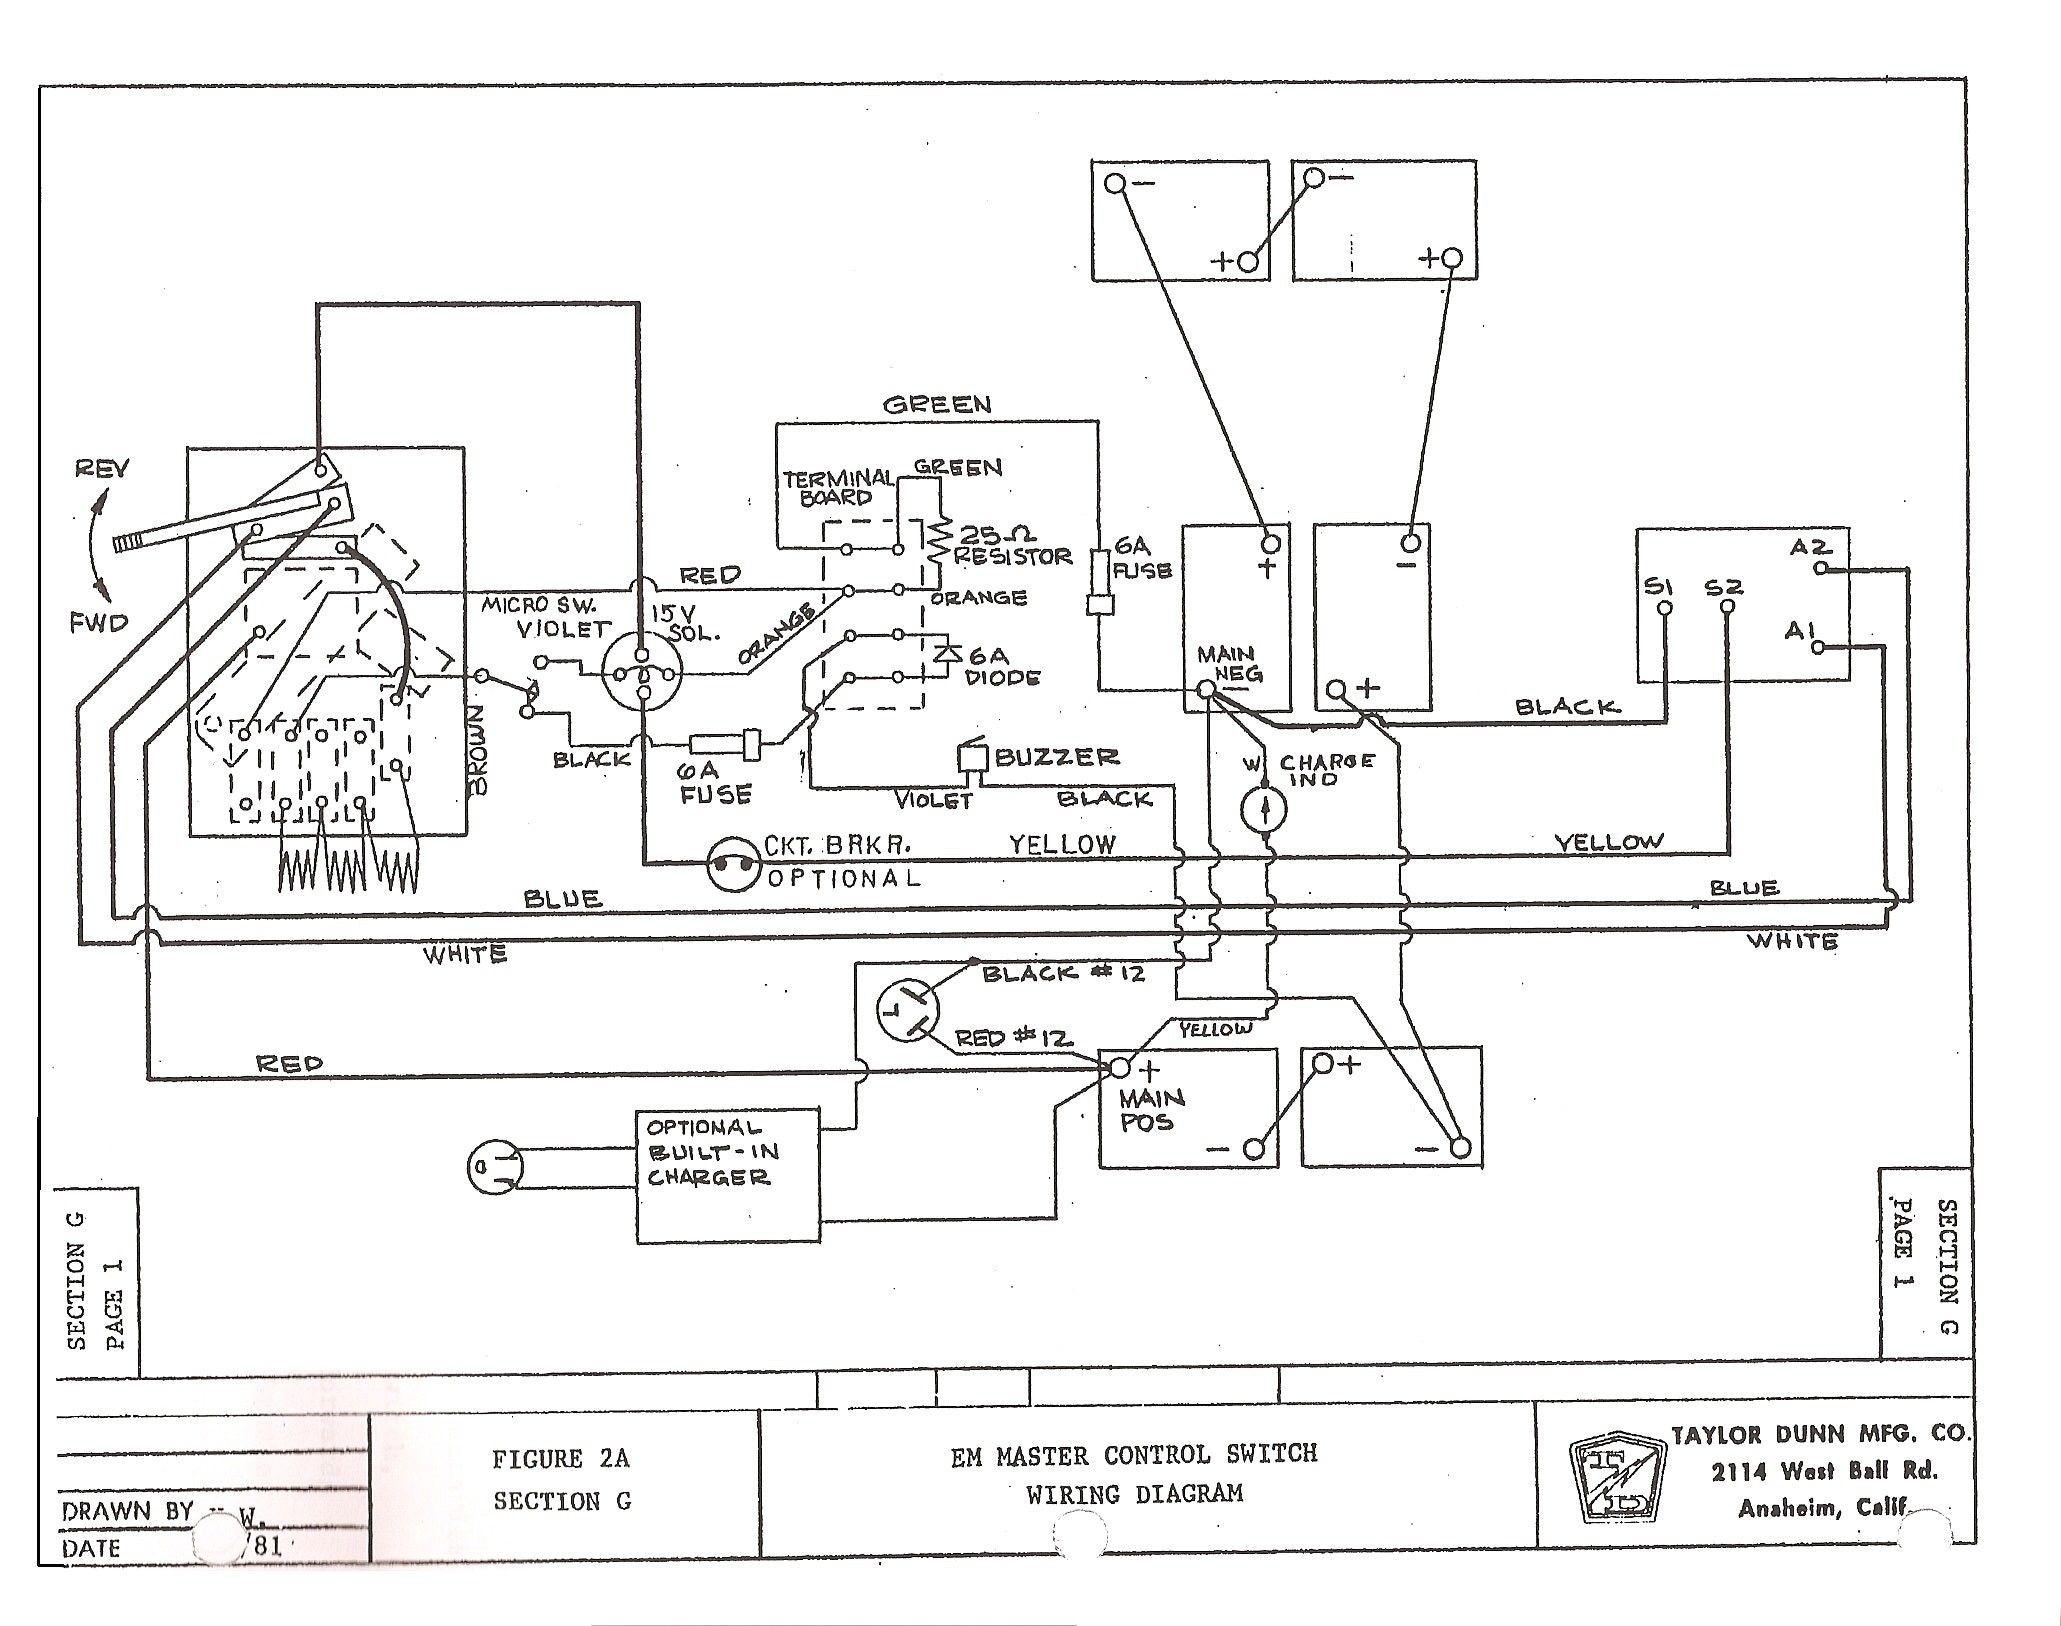 Ezgo Gas Golf Cart Wiring Diagram G19 Wiring Diagram Of Ezgo Gas Golf Cart Wiring Diagram